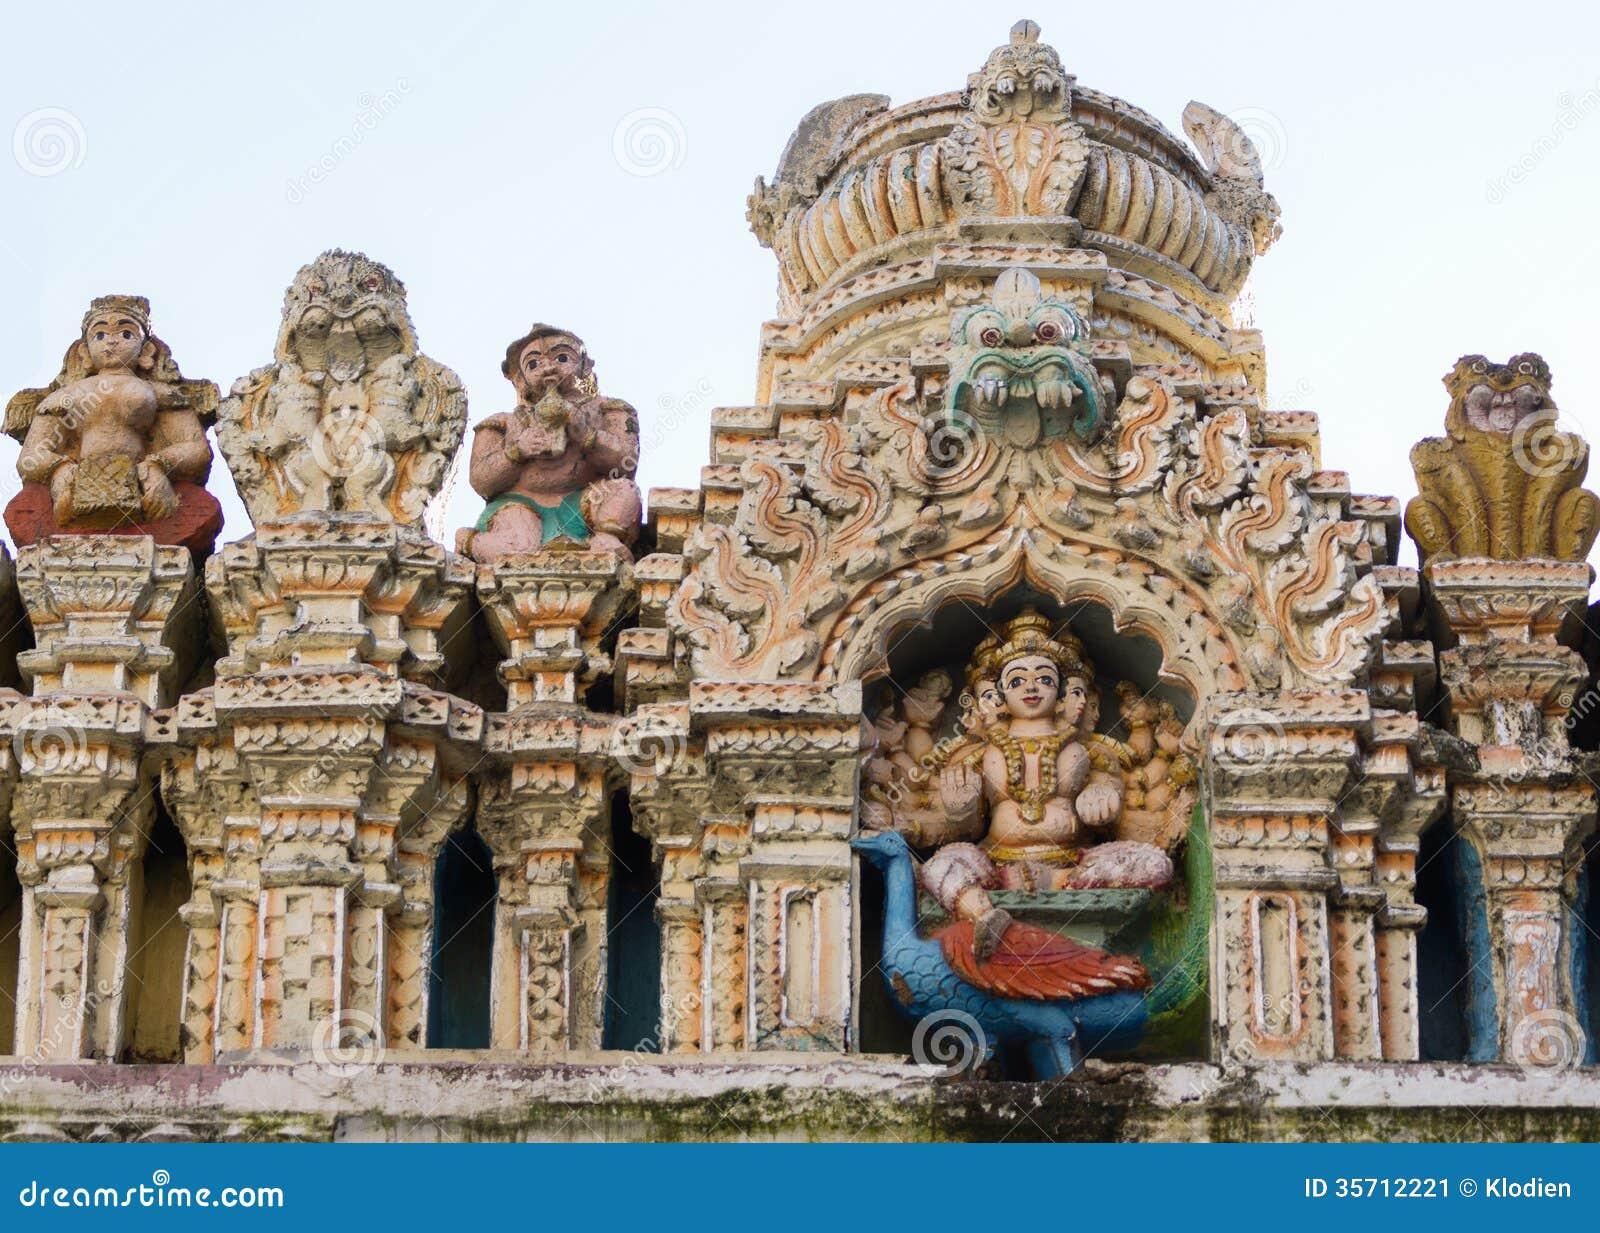 Goddess saraswati temple in bangalore